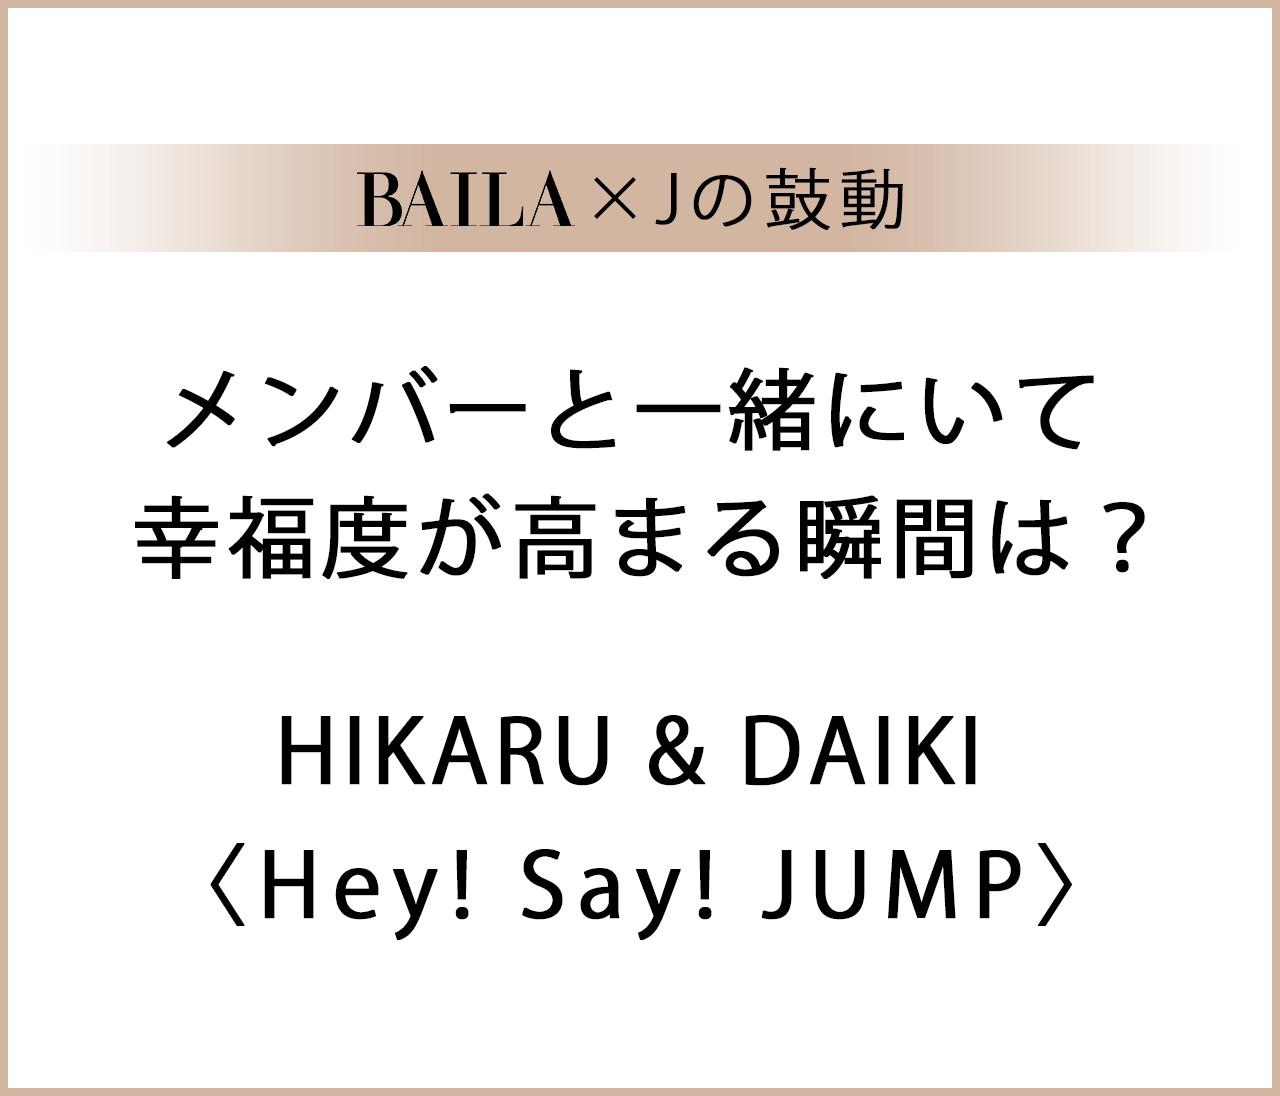 【 #HeySayJUMP #八乙女光 #有岡大貴 】メンバーと一緒にいて幸福度が高まる瞬間は?【BAILA × Jの鼓動】